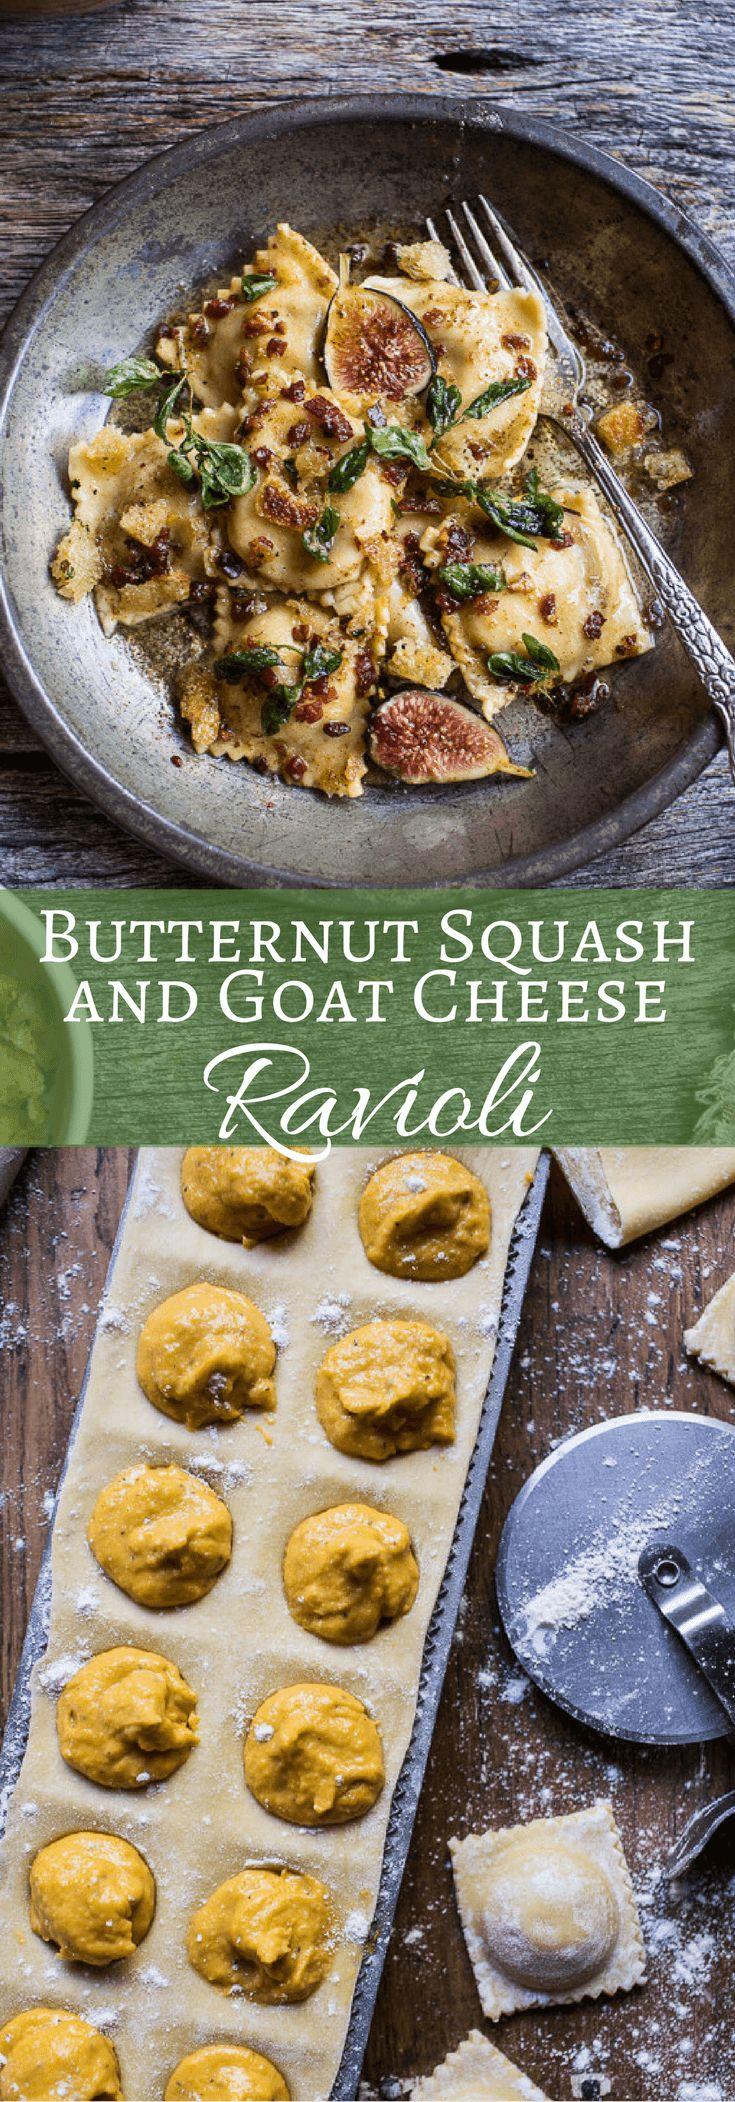 Butternut Squash and Goat Cheese Ravioli | halfbakedharvest.com @hbharvest